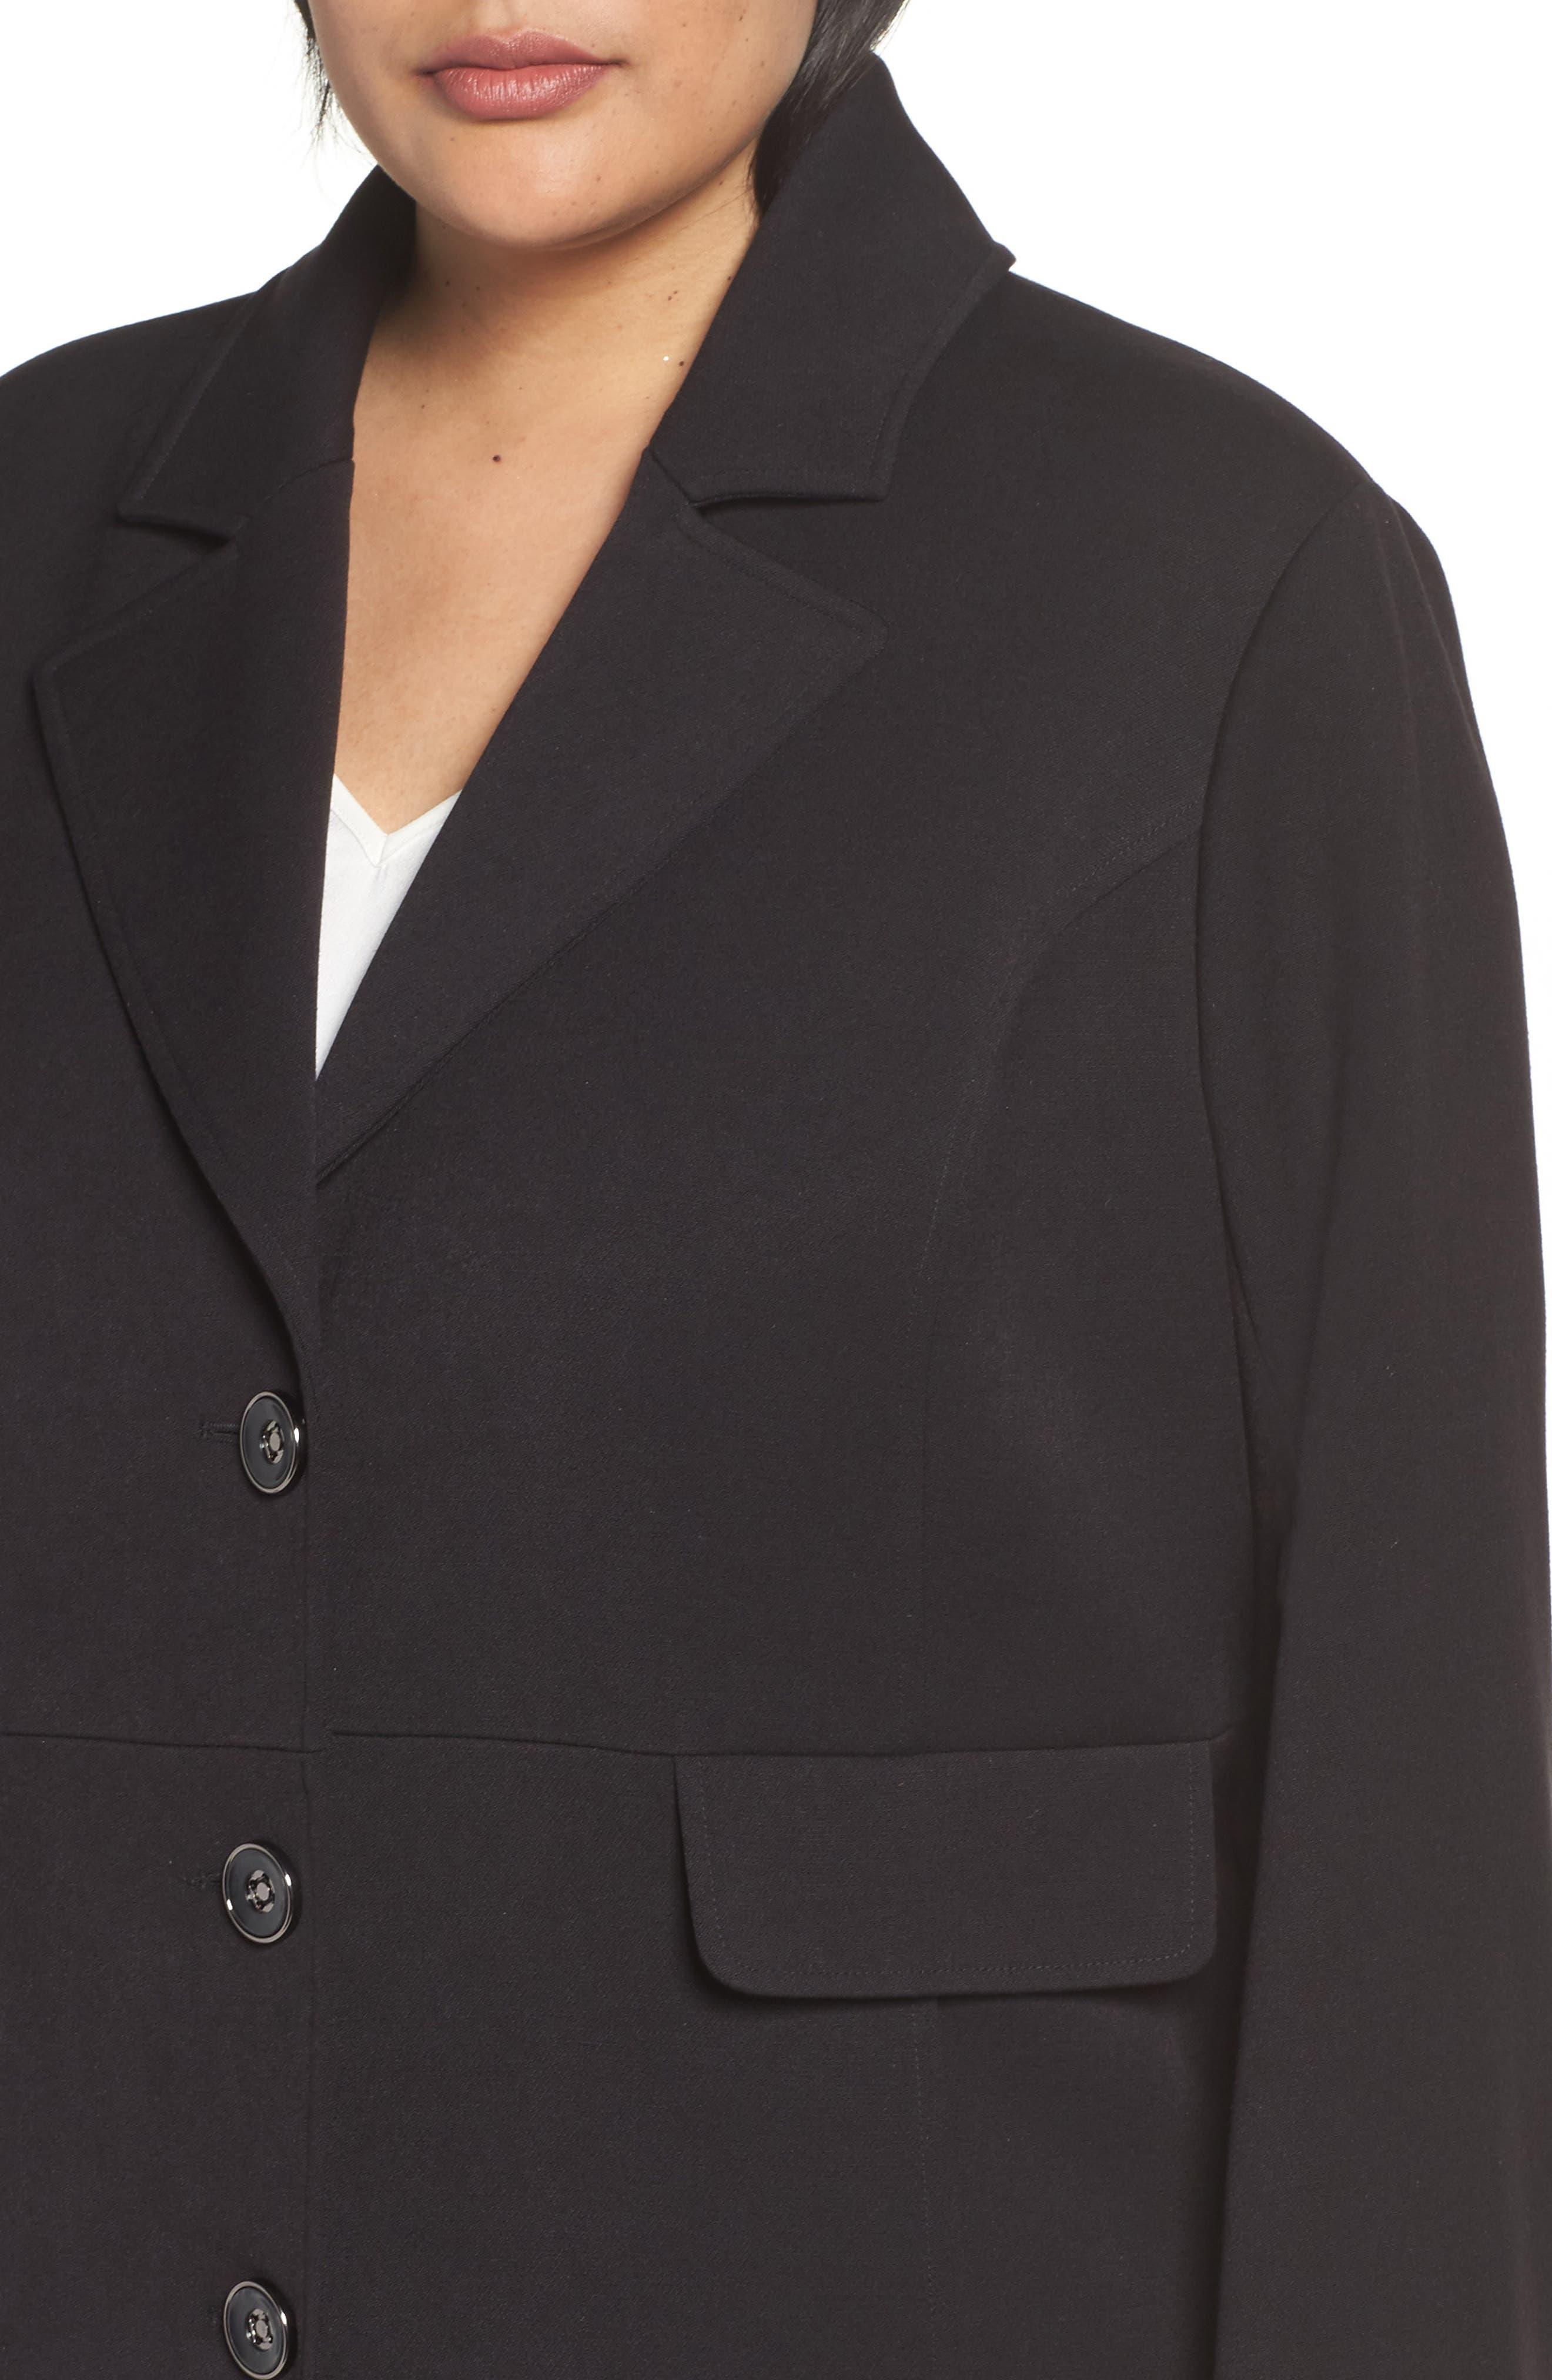 Single Breasted Ponte Coat,                             Alternate thumbnail 4, color,                             001